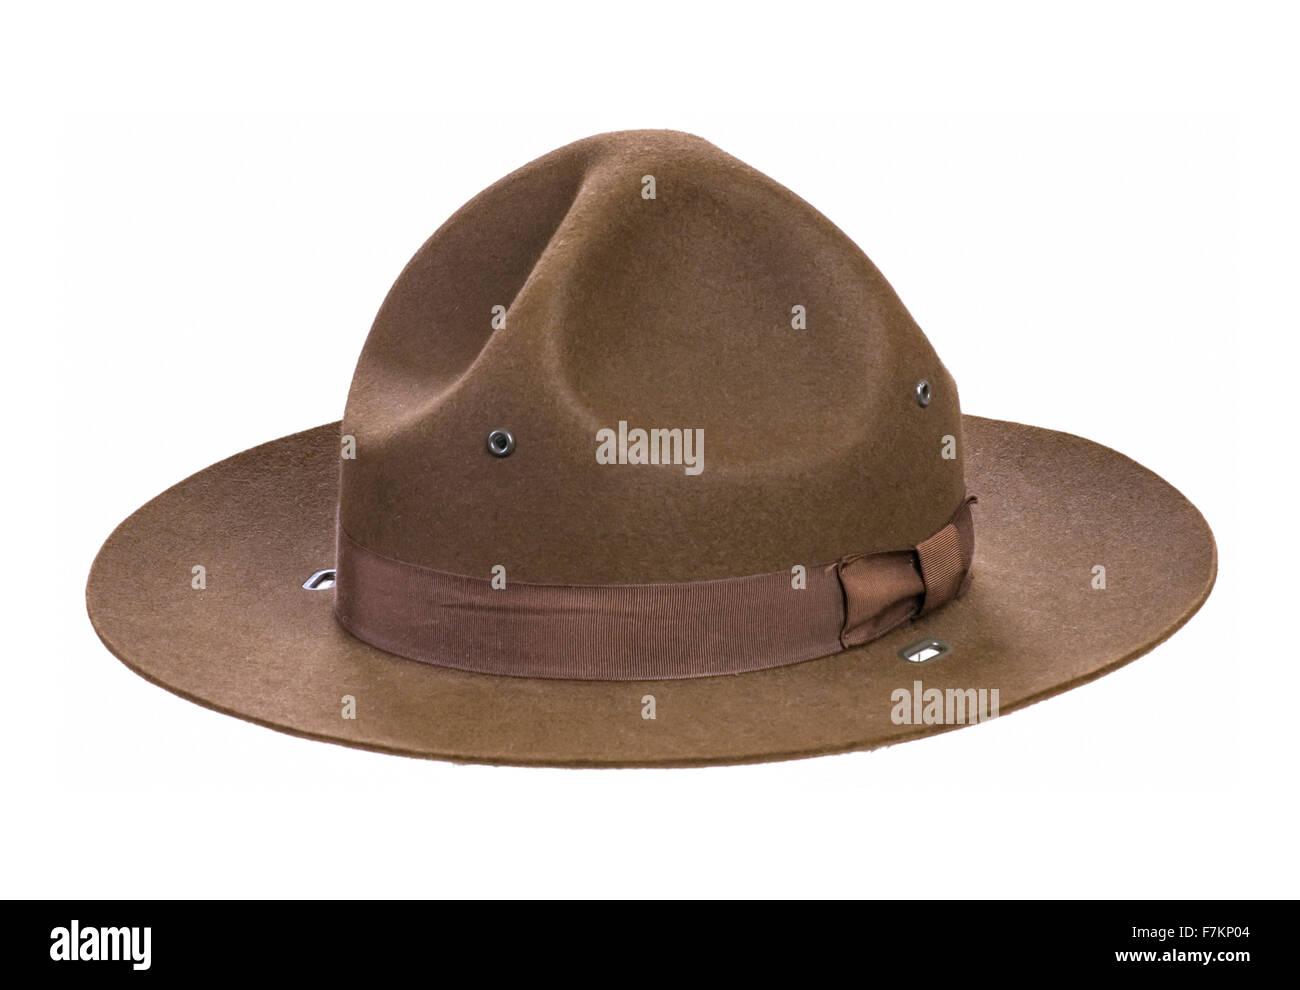 187153b9d6edc Campaign Hat Stock Photos   Campaign Hat Stock Images - Alamy